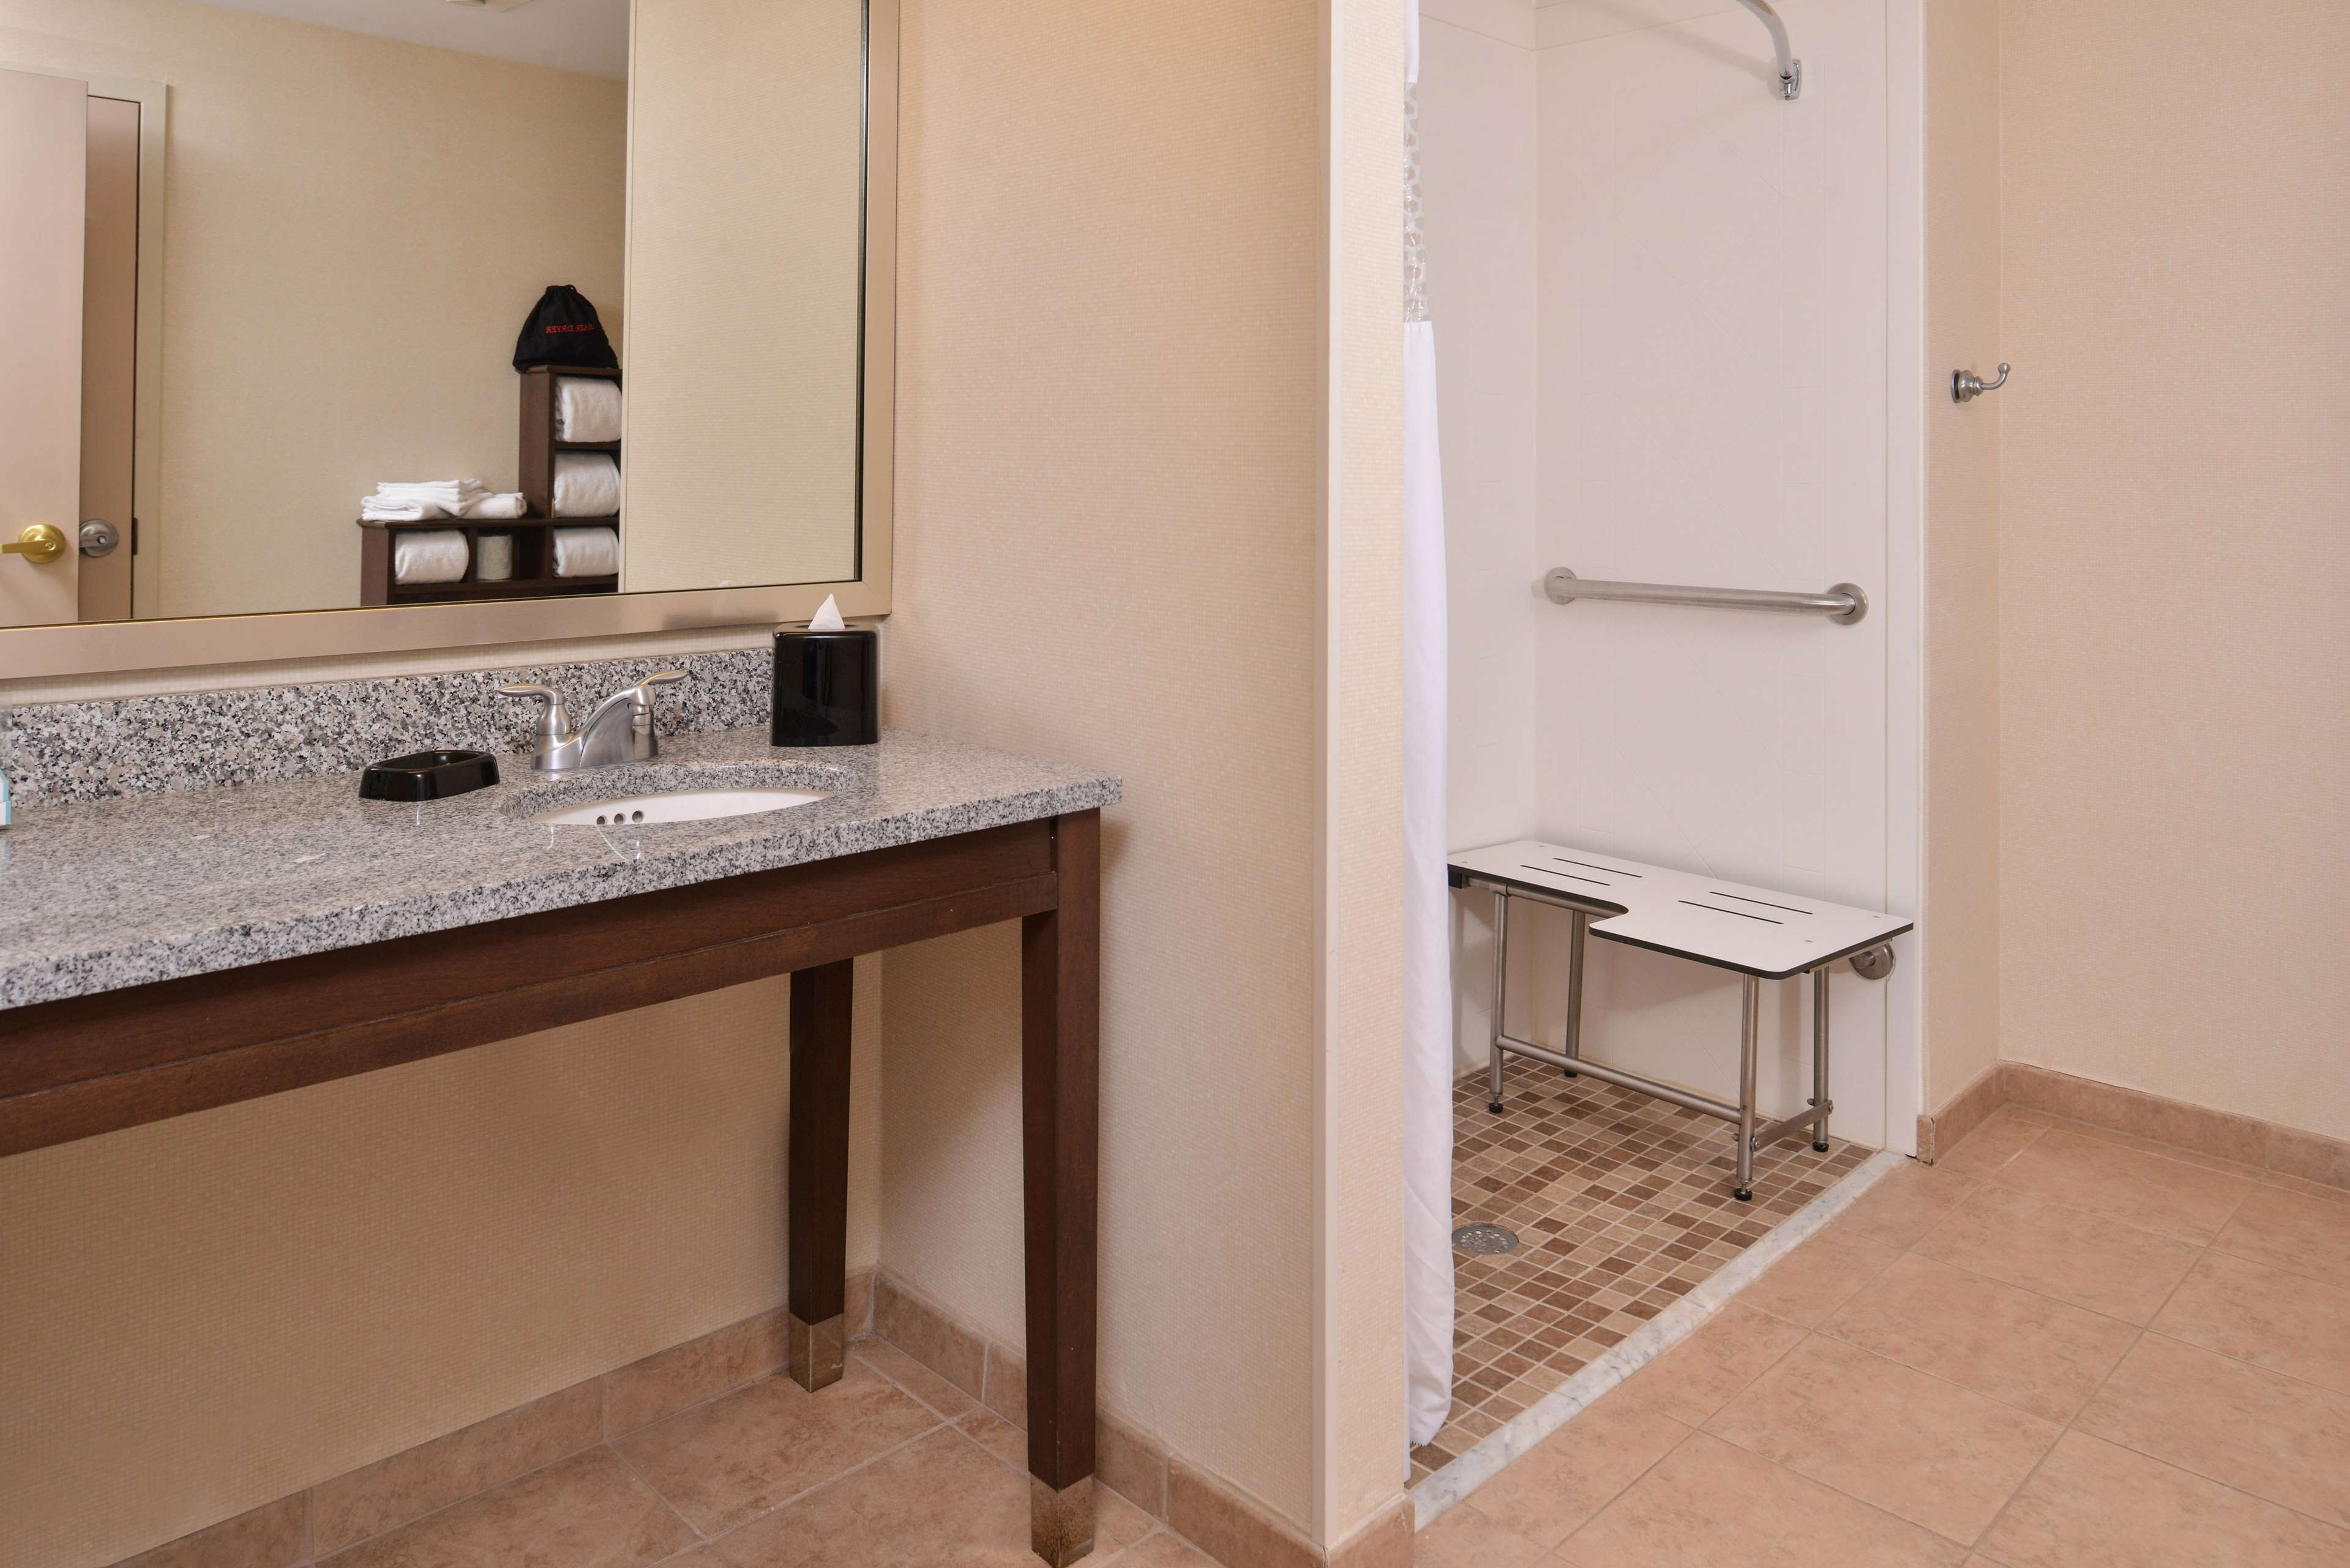 Hampton Inn & Suites Newport News (Oyster Point) image 41